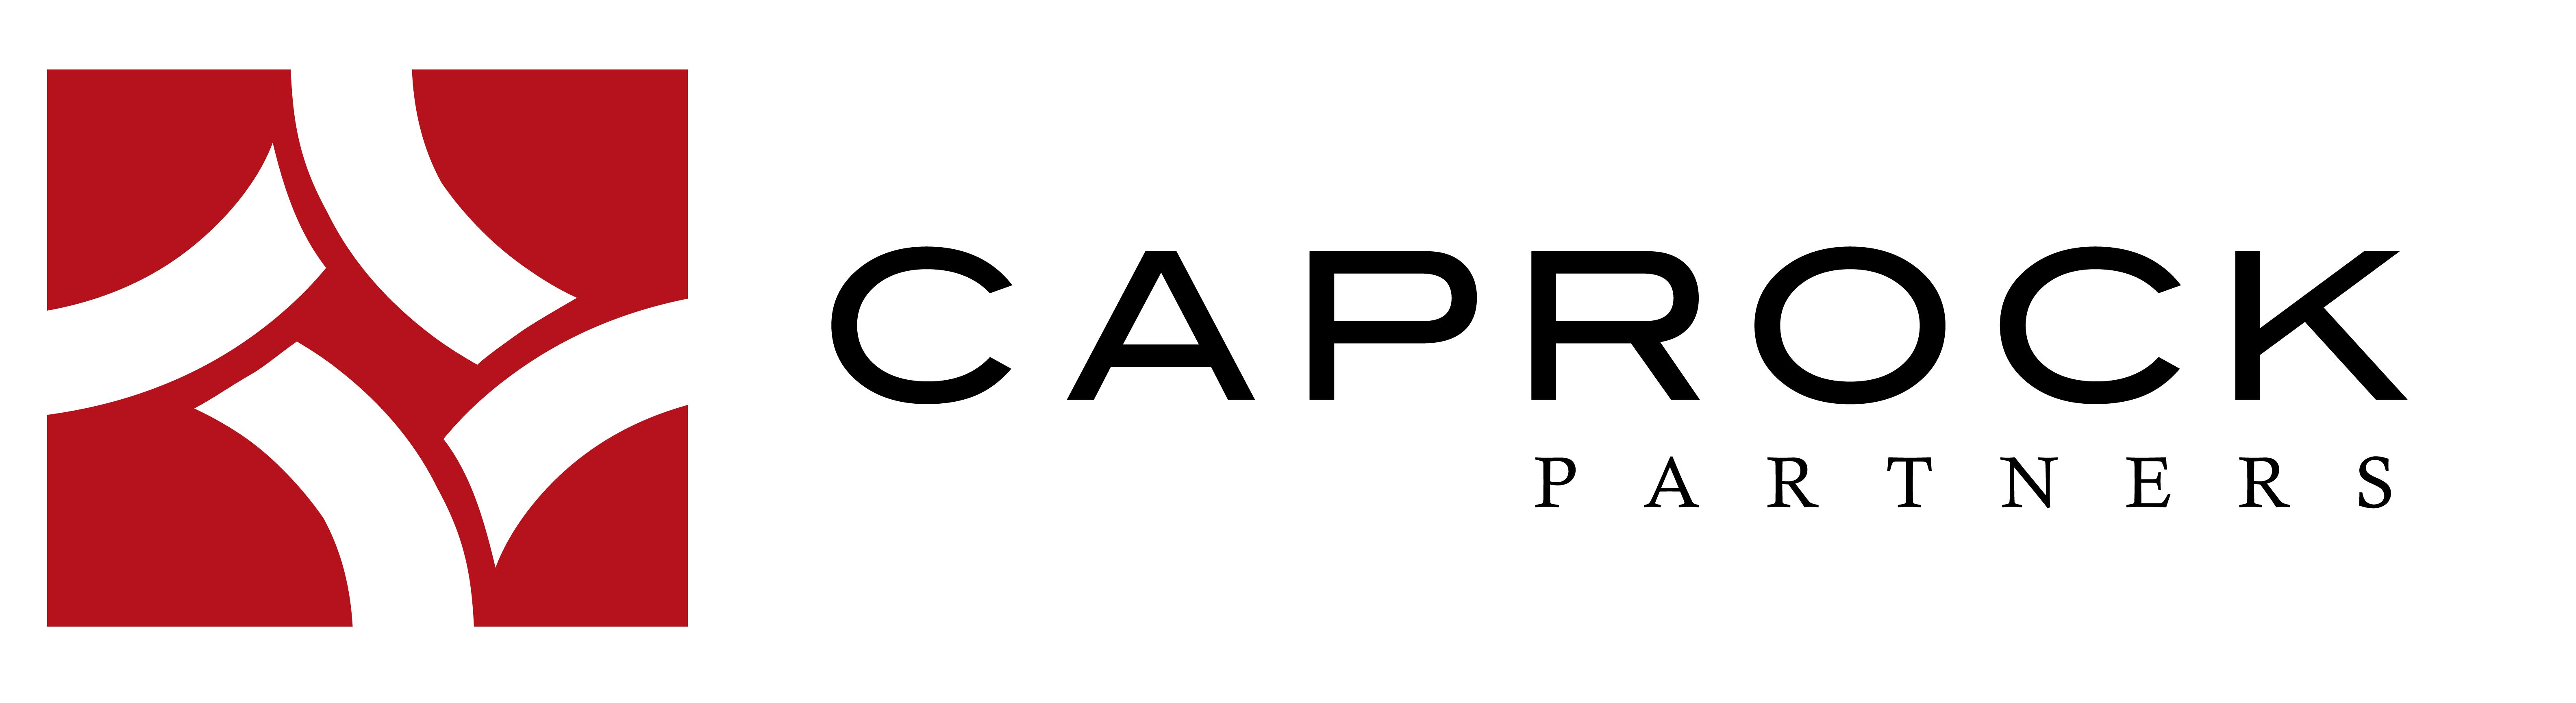 Caprock Partners